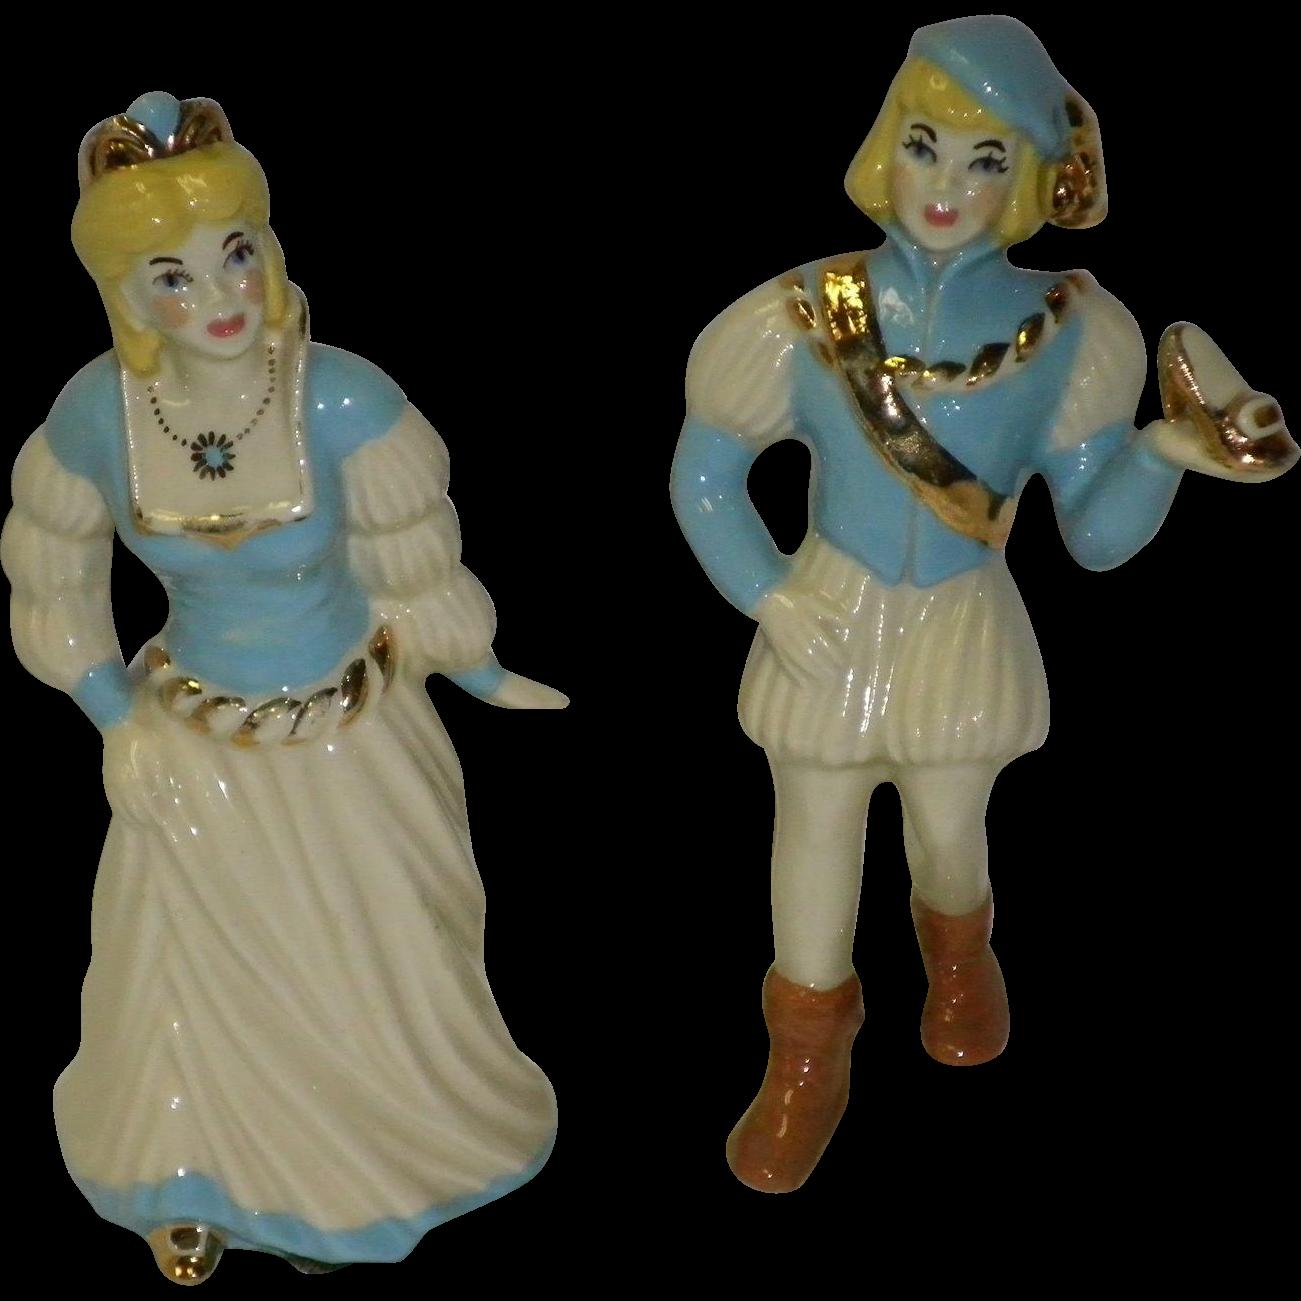 Ceramic Art Studio Figurines Cinderella And Prince Charming